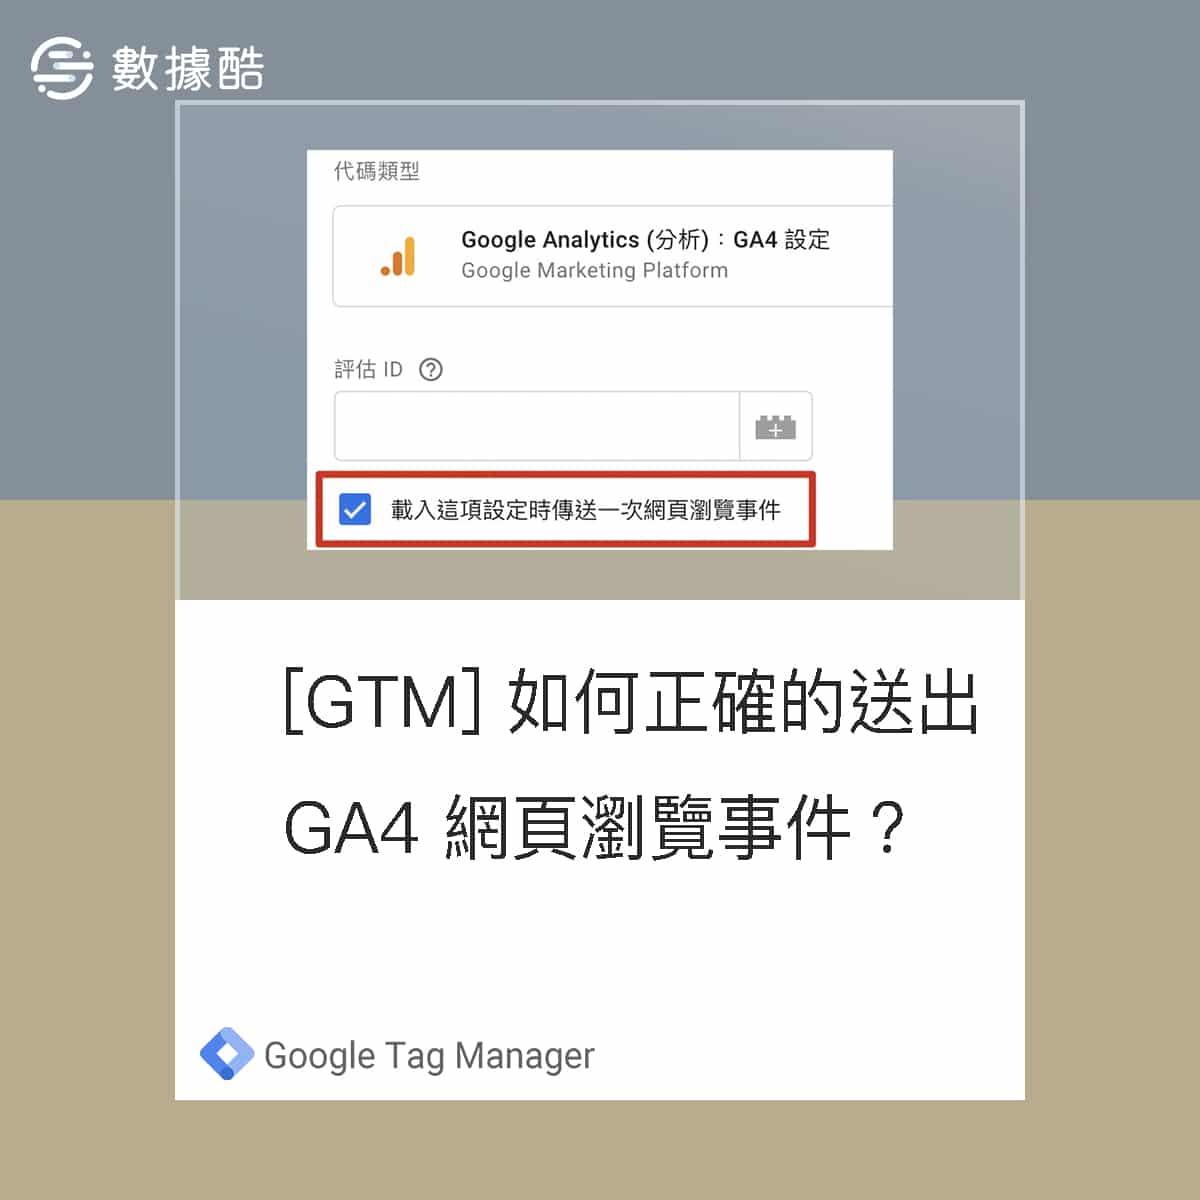 GTM 如何正確的送出 GA4 網頁瀏覽事件?